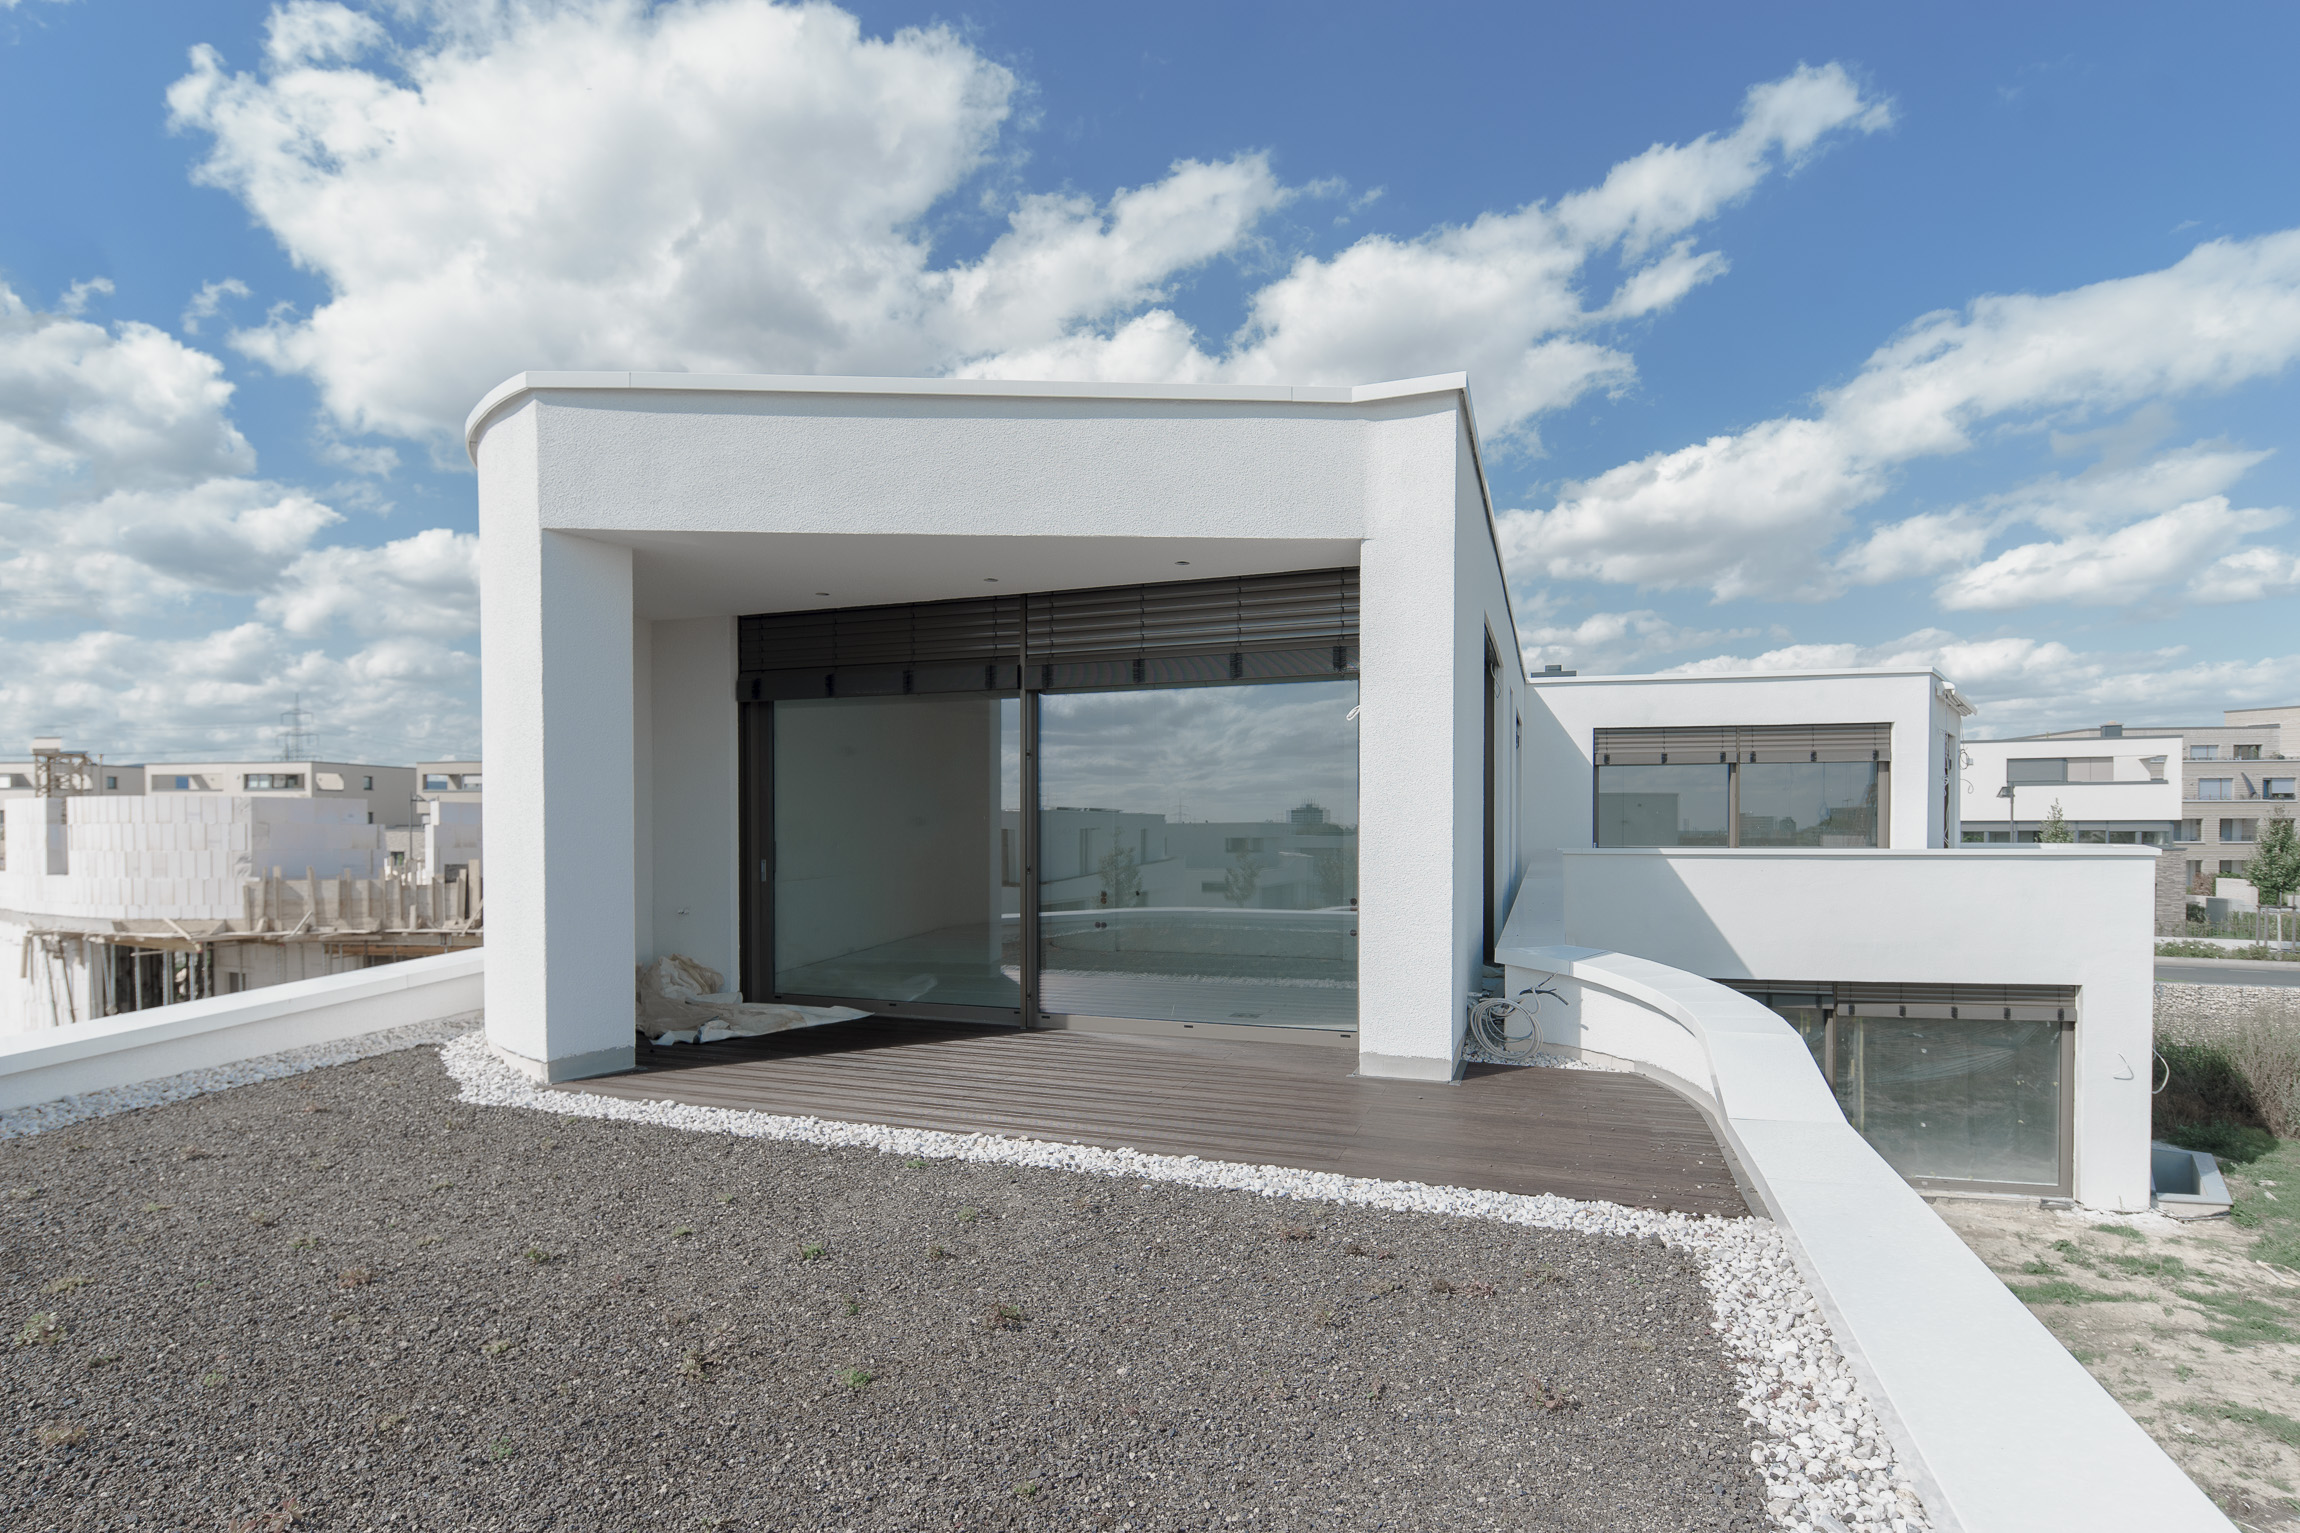 innenarchitekten frankfurt umgebung innenarchitekten frankfurt umgebung lokale geheimtipps aus. Black Bedroom Furniture Sets. Home Design Ideas